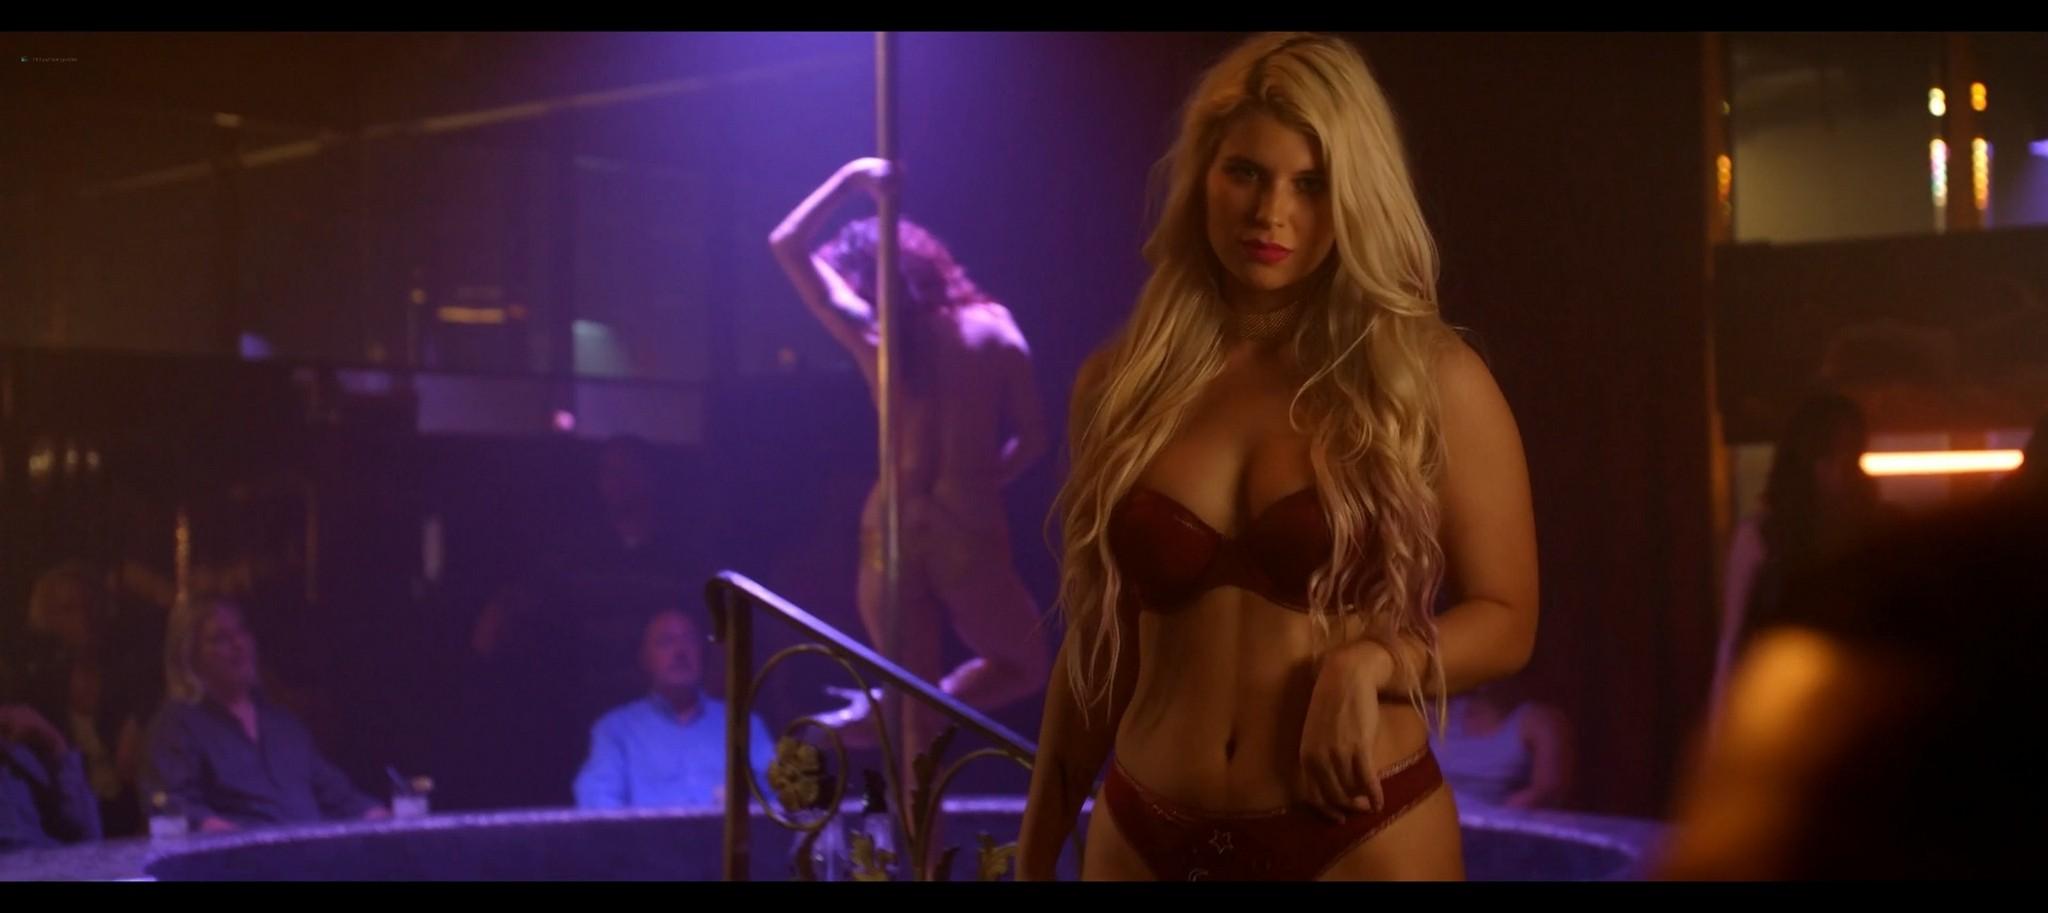 Kenzie Dalton hot Drue Knapp Ava Locklear sexy A Dark Foe 2021 1080p Web